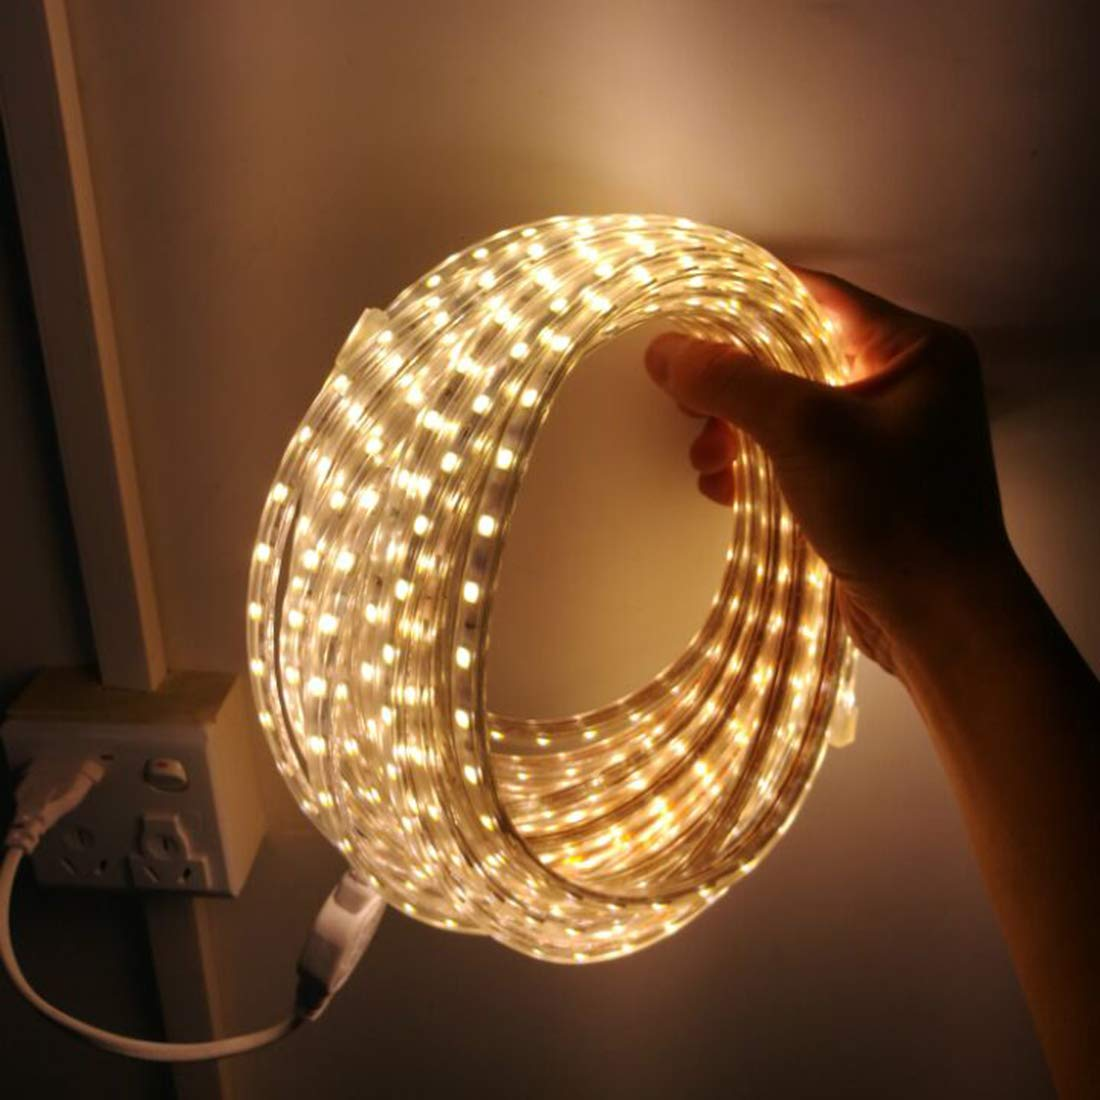 Ruban LED Etanche Lumineux Bandeau Led 220v Ruban /à LED 5050 IP65 Etanche Bande Strip Led 4m Blanc chaud